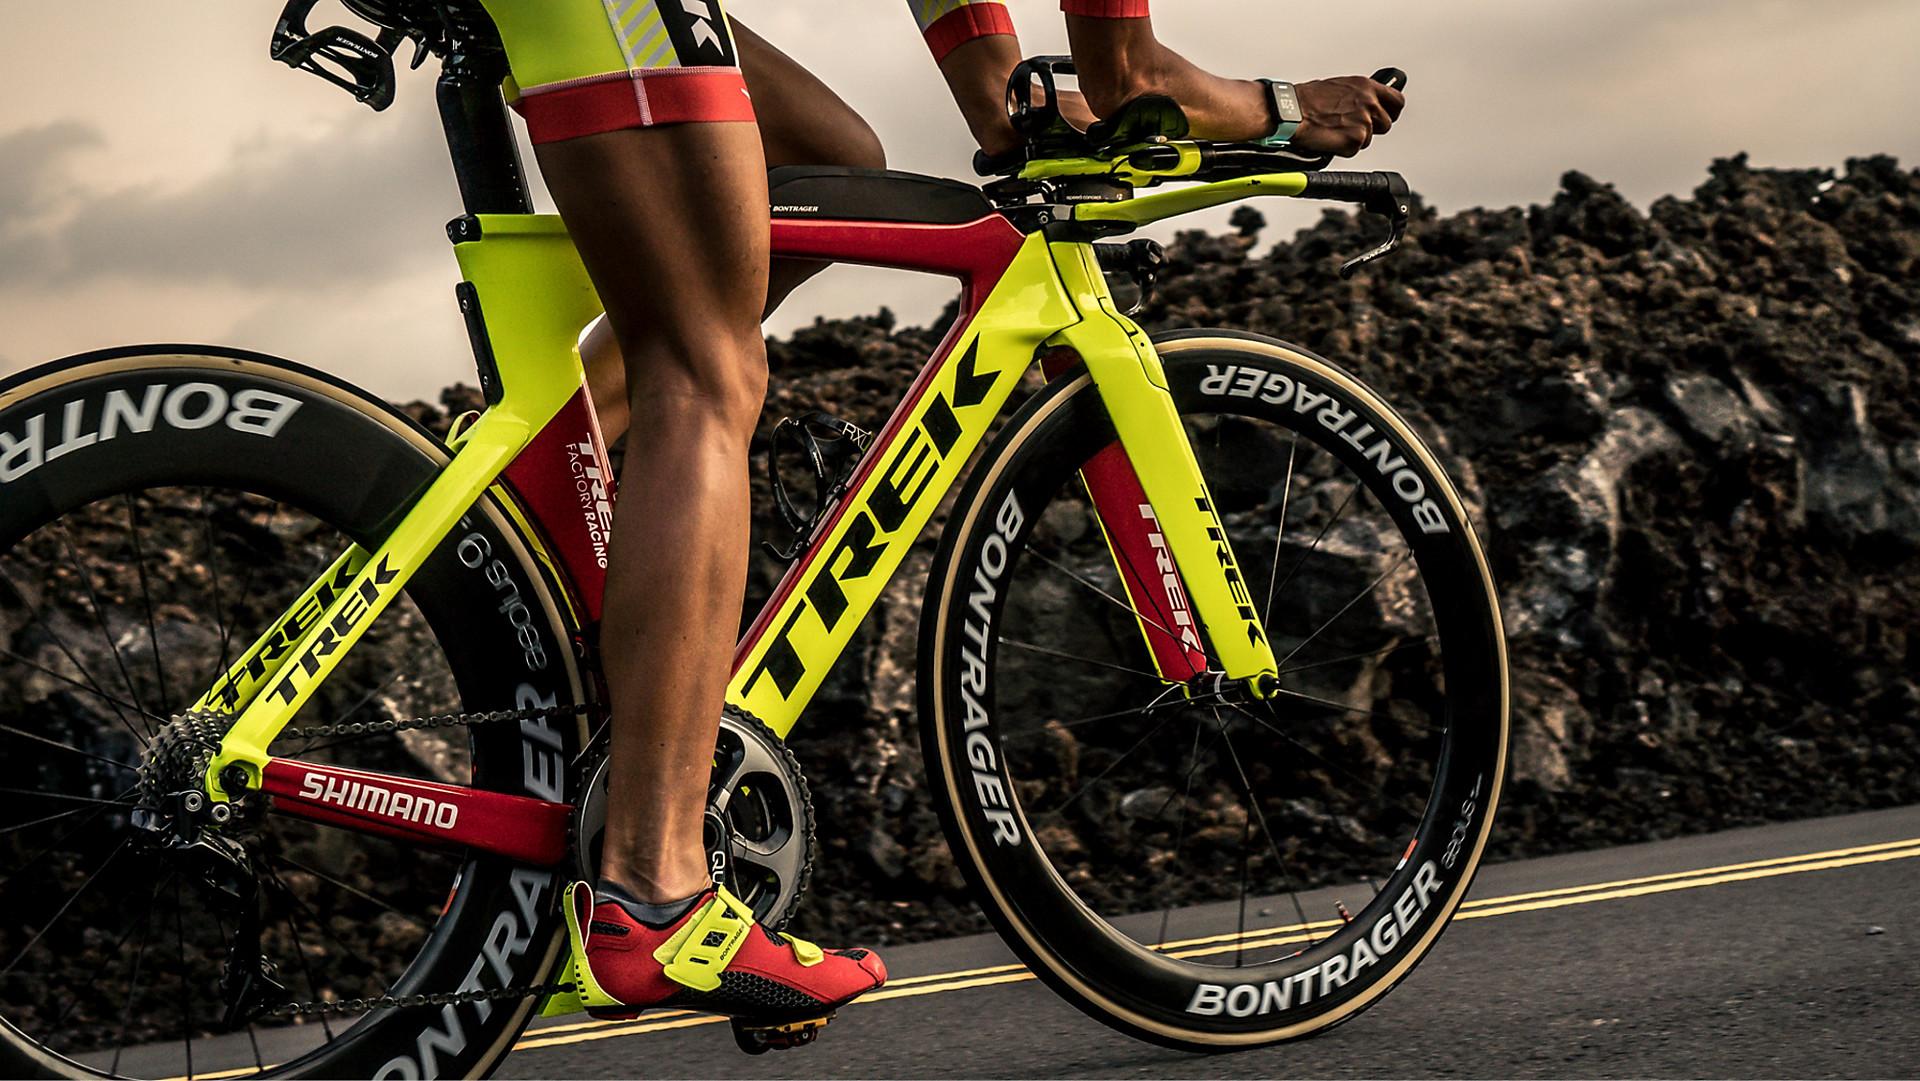 Triathlon bikes | Trek Bikes